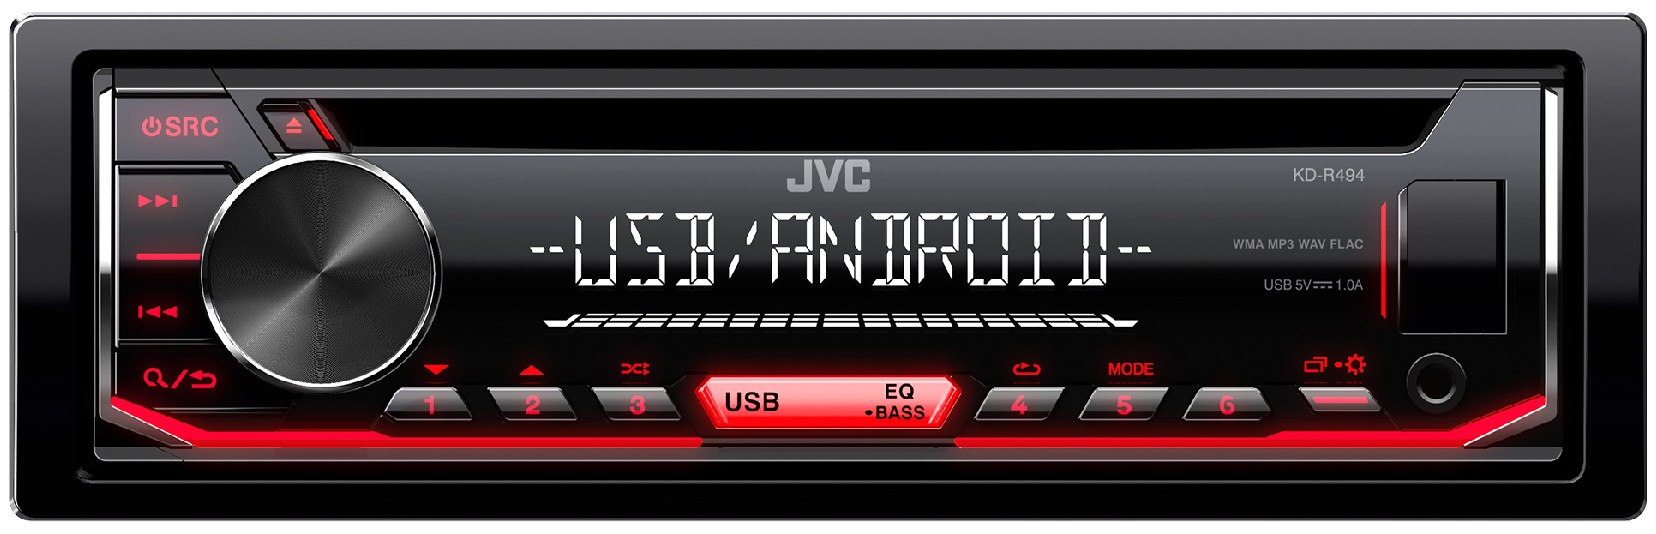 AUTORADIO JVC KD-R484